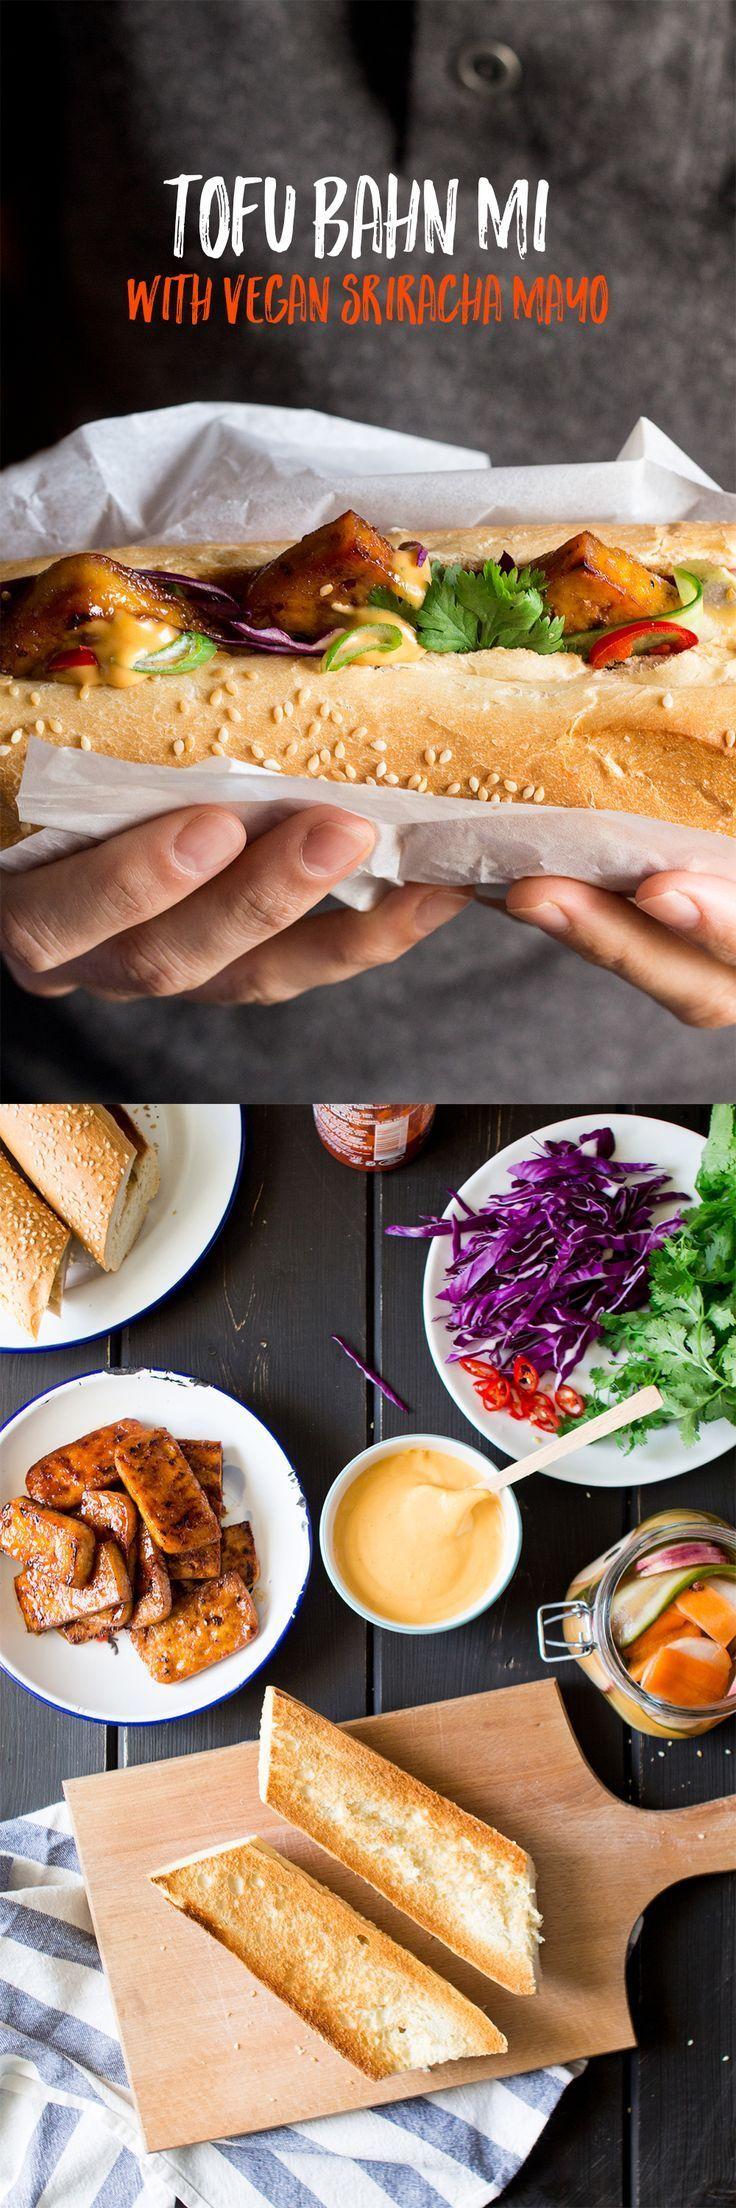 #vegan bahn mi sandwich deep-filled with tasty tofu / fresh veg / herbs and pickles. Topped with vegan sriracha mayo #glutenfree